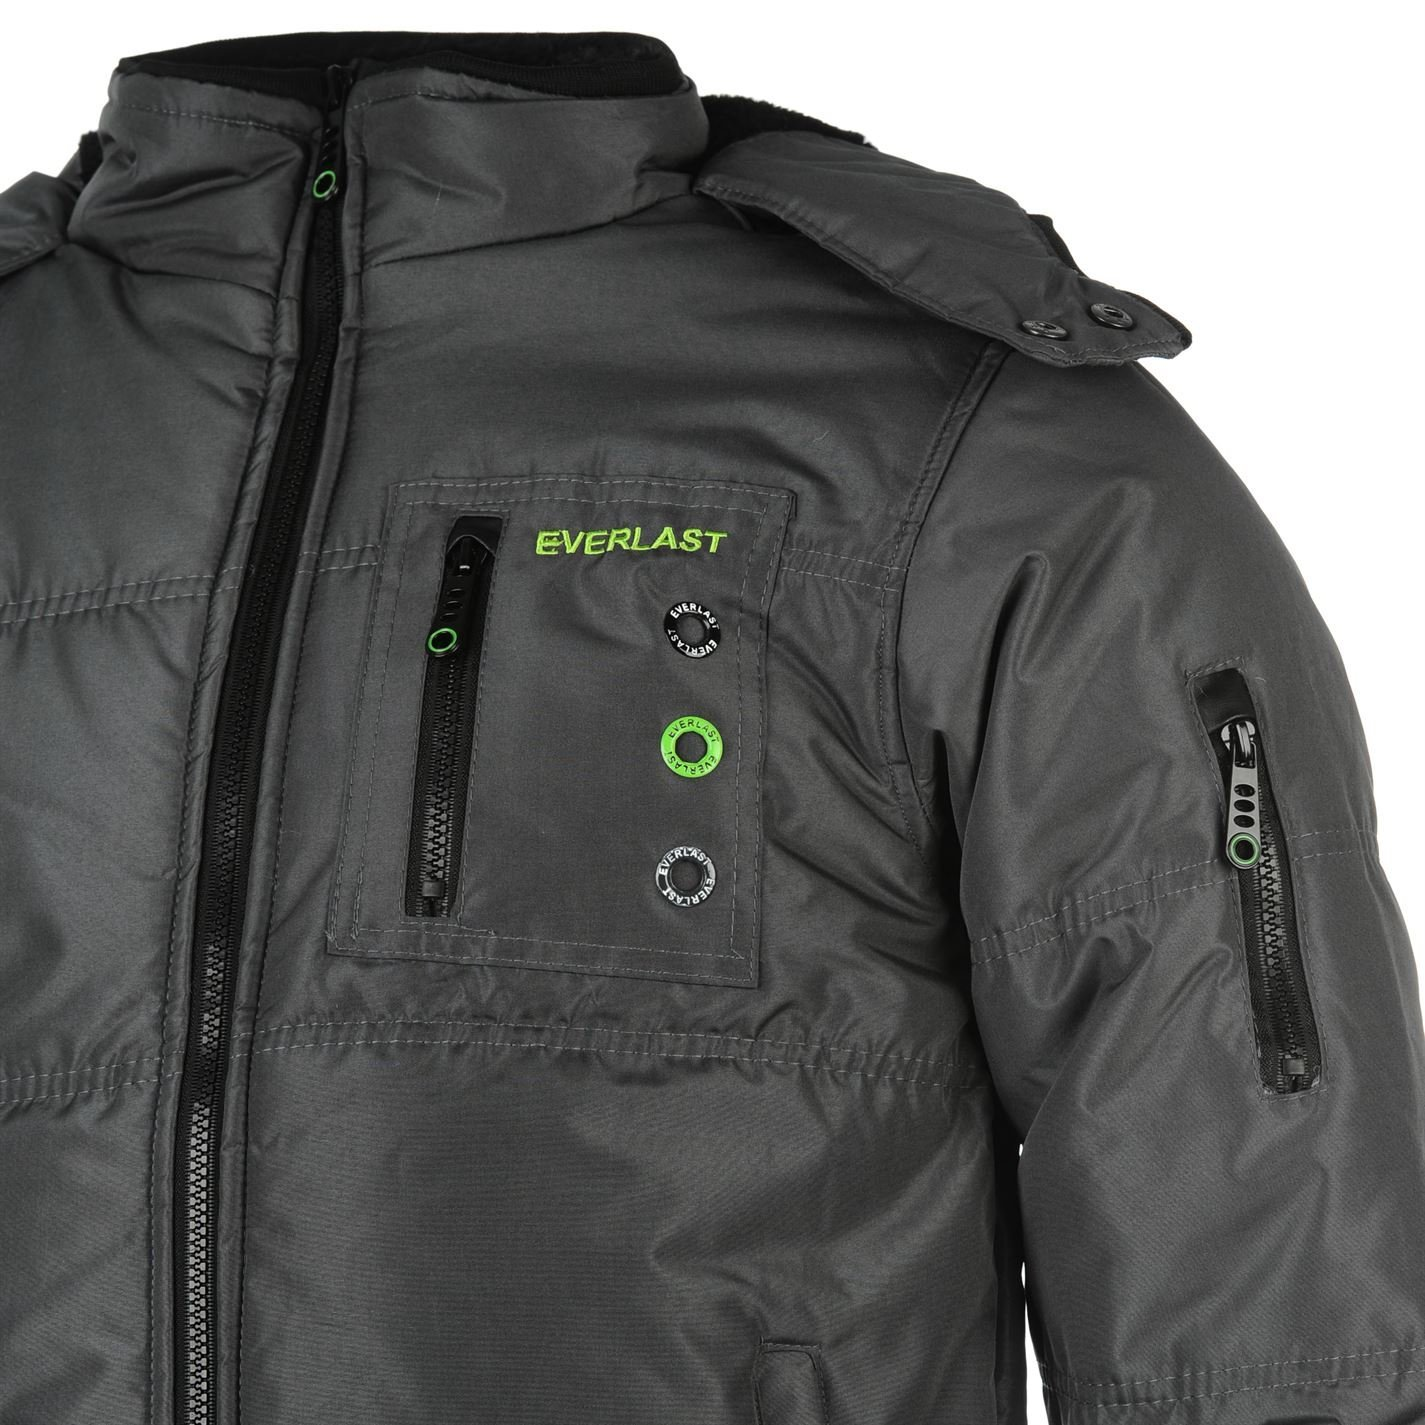 Everlast Herbst Jacke Herren Bomber Herrenjacke Leichtgewicht Casual Jacket 6244